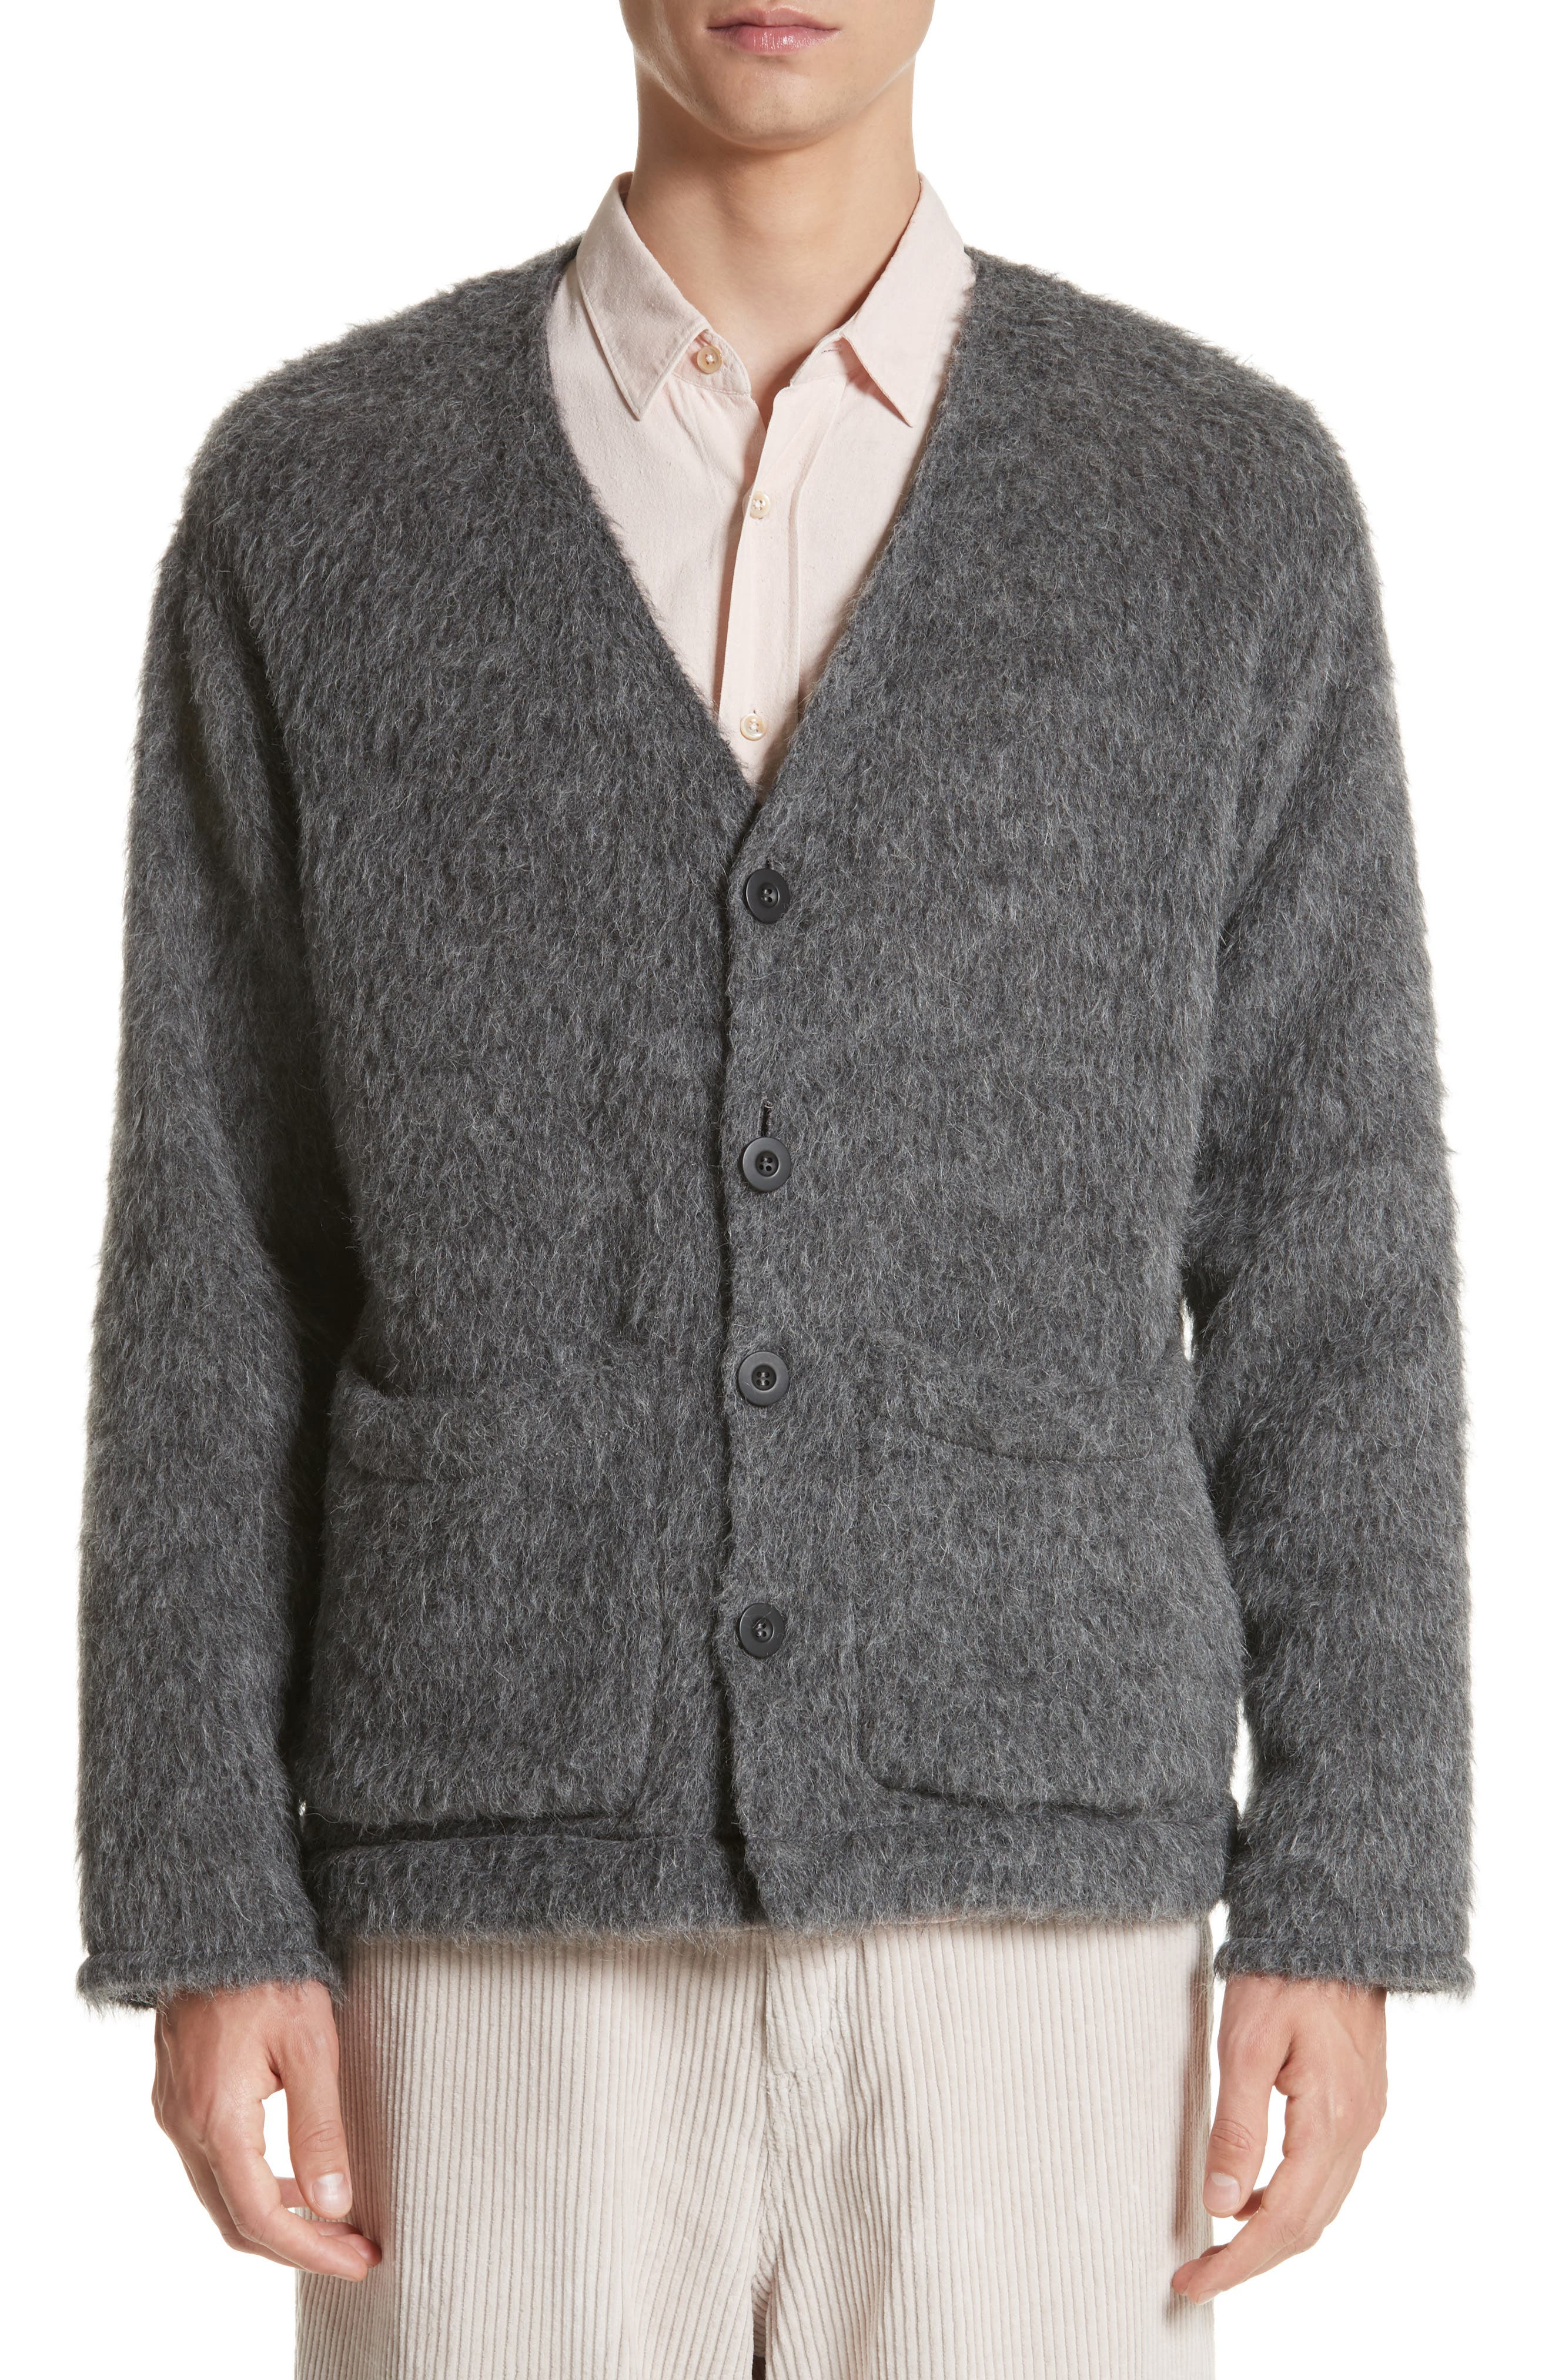 Men's Grey Cardigan Sweaters & Jackets   Nordstrom